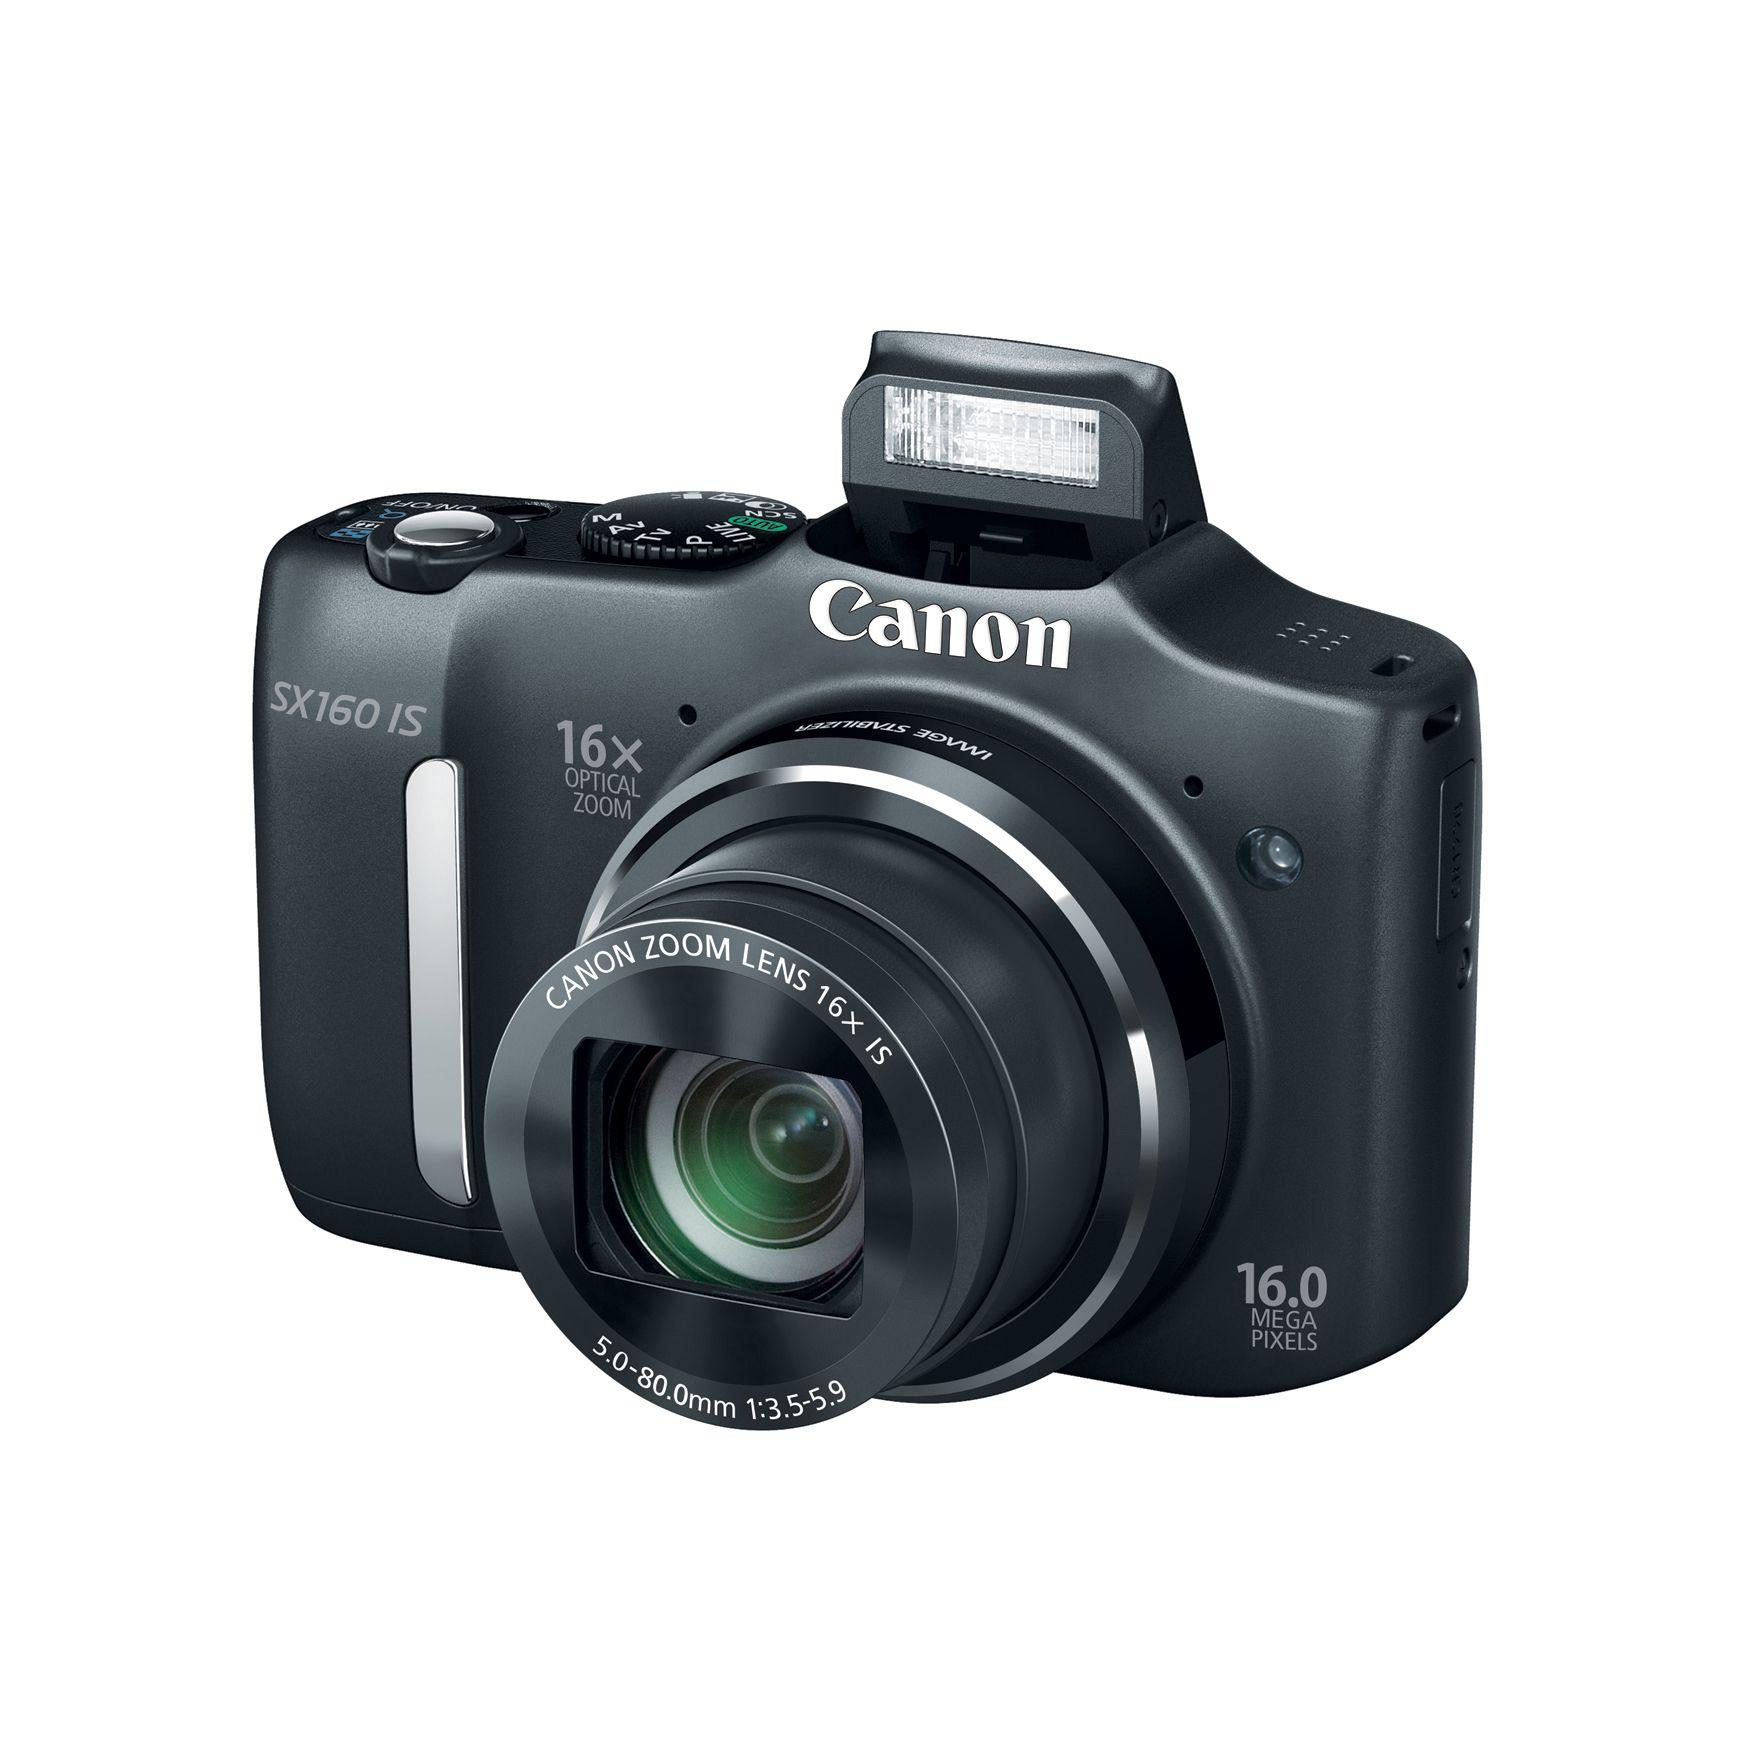 Canon PowerShot SX160 IS Digital Camera - Black